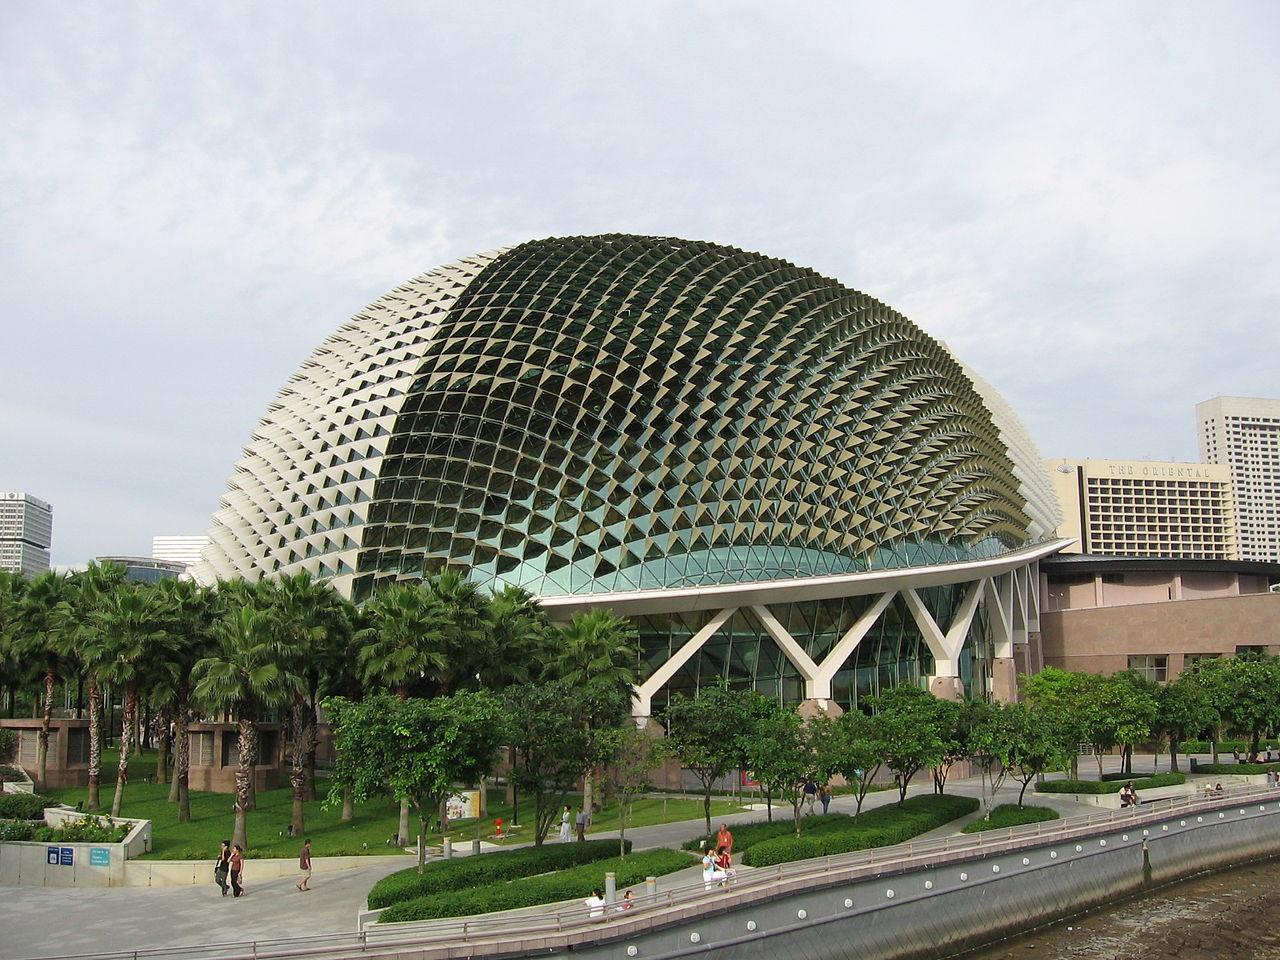 Filethe Esplanade 3 Singapore Dec 05jpg Wikimedia